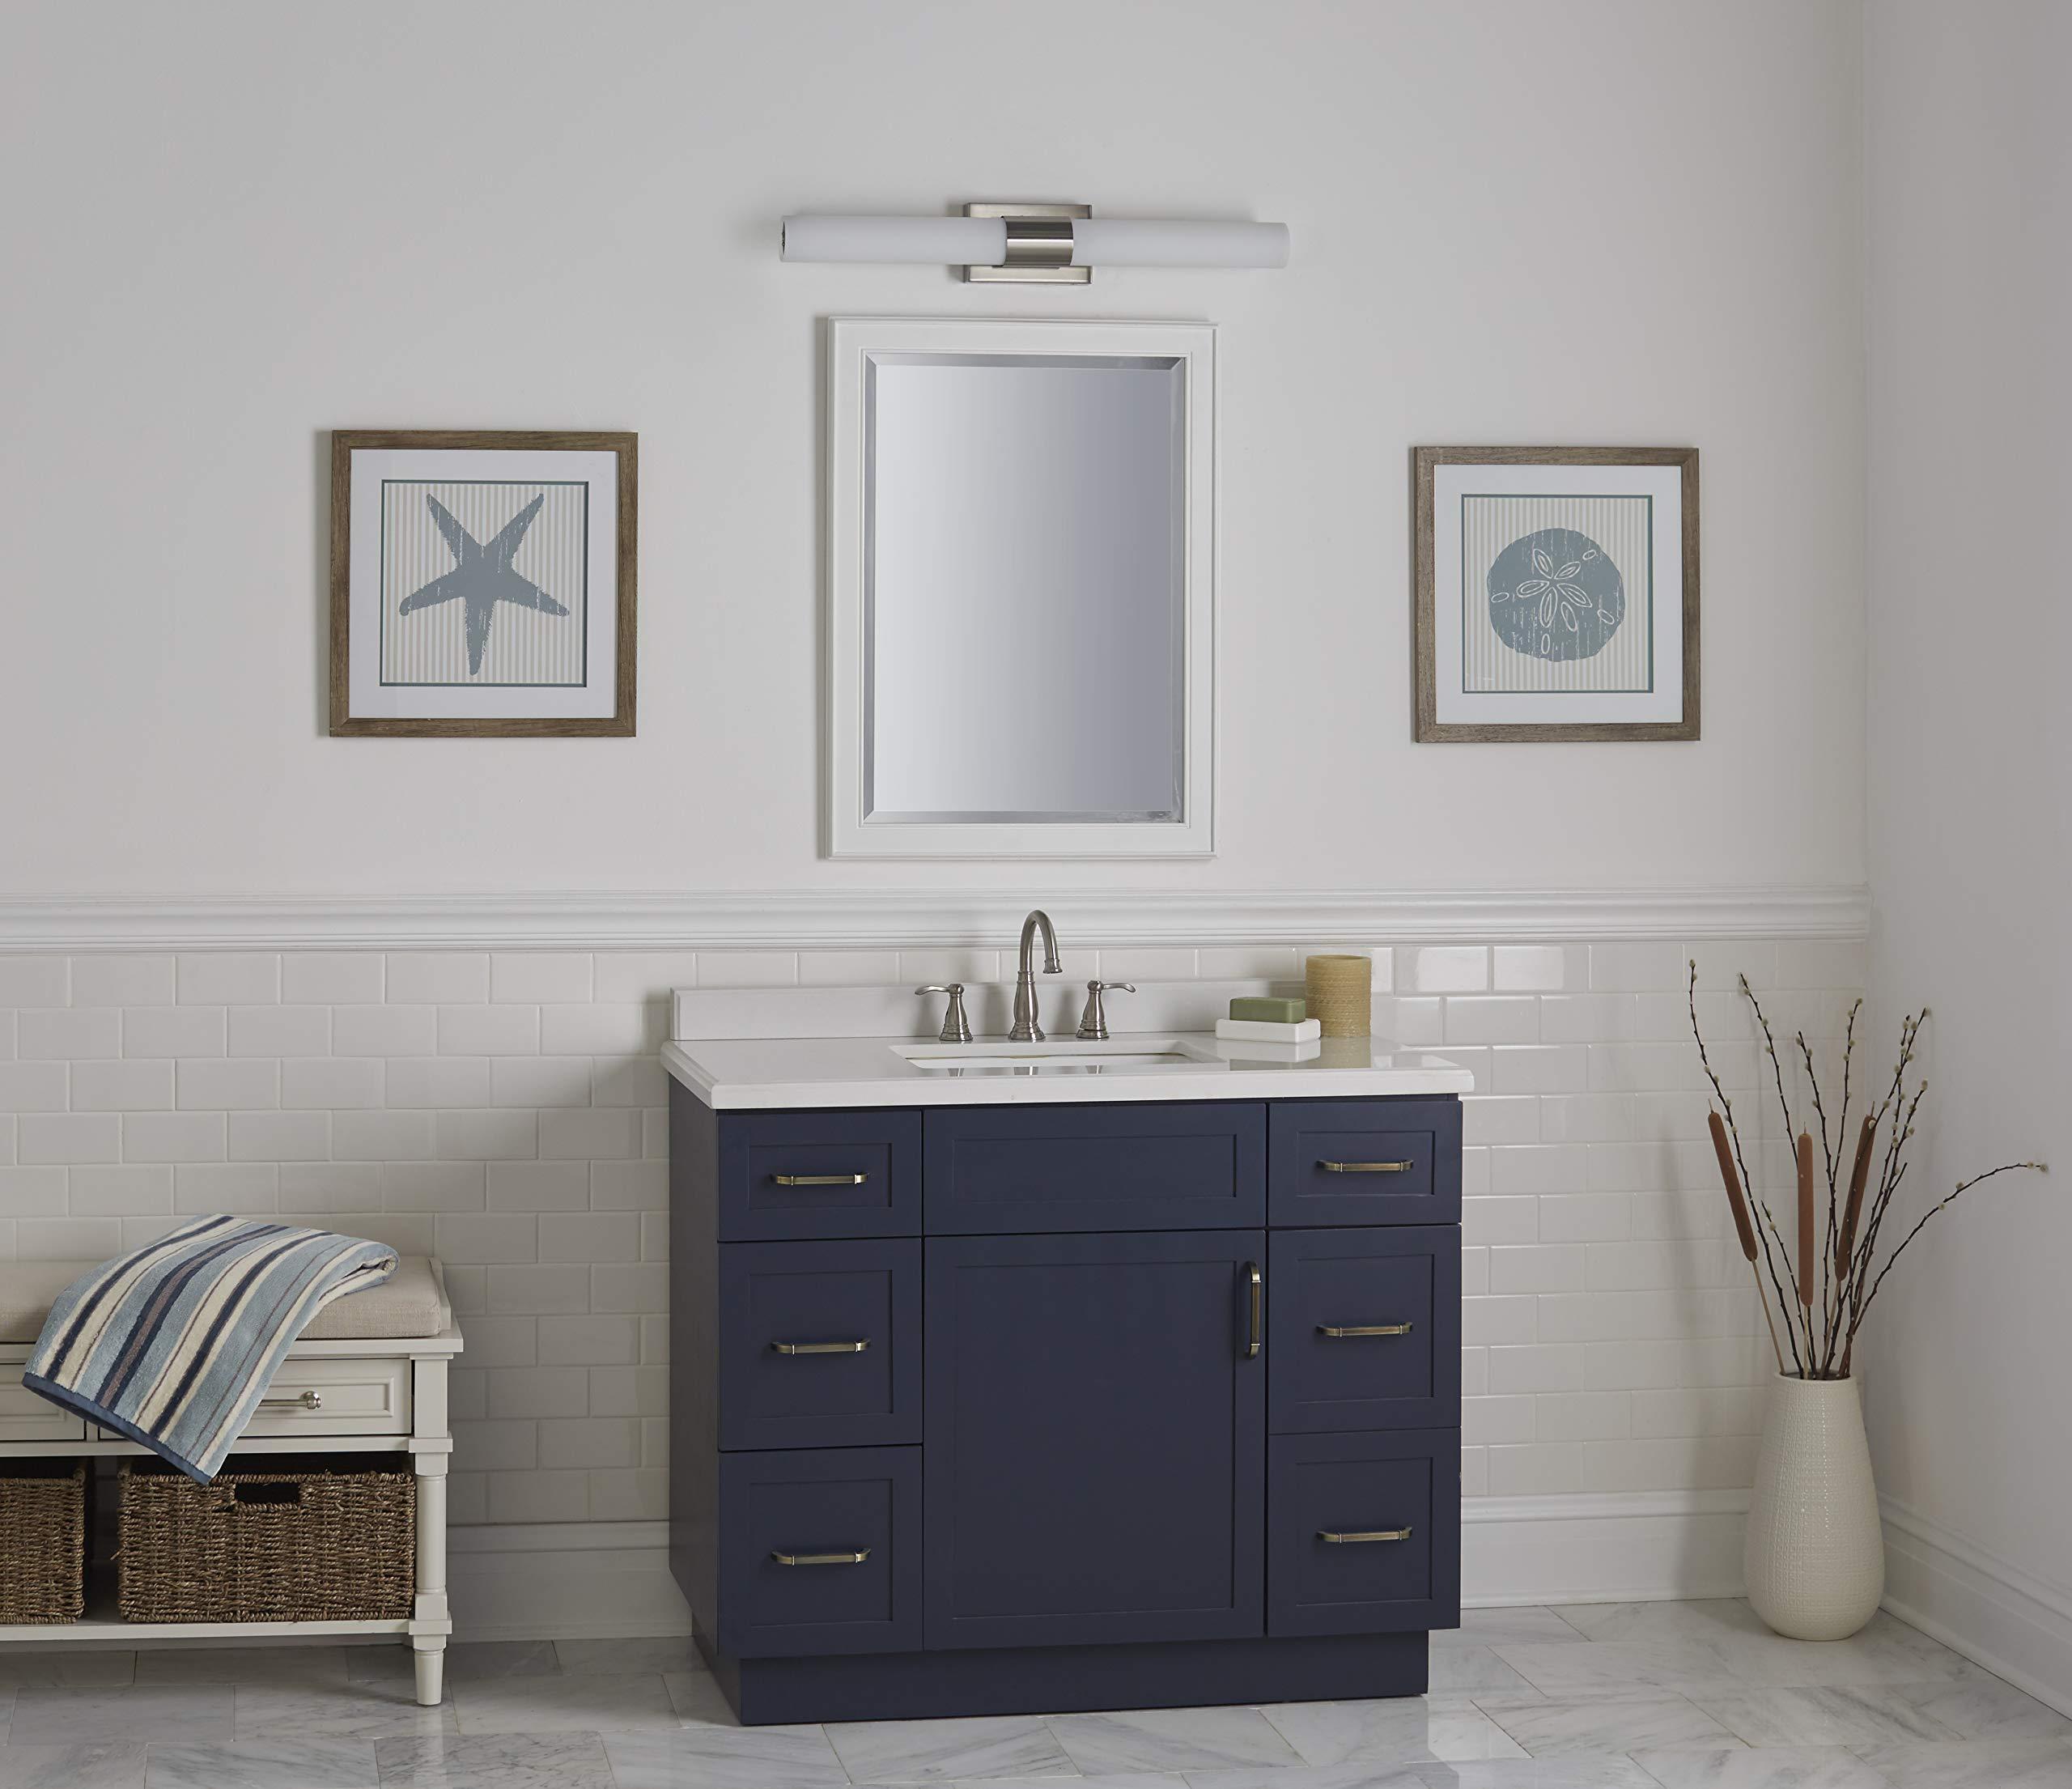 Perpetua 30 inch Integrated LED Bathroom Vanity Lights | Brushed Nickel Bathroom Light LL-SC1043-BN by Linea di Liara (Image #4)